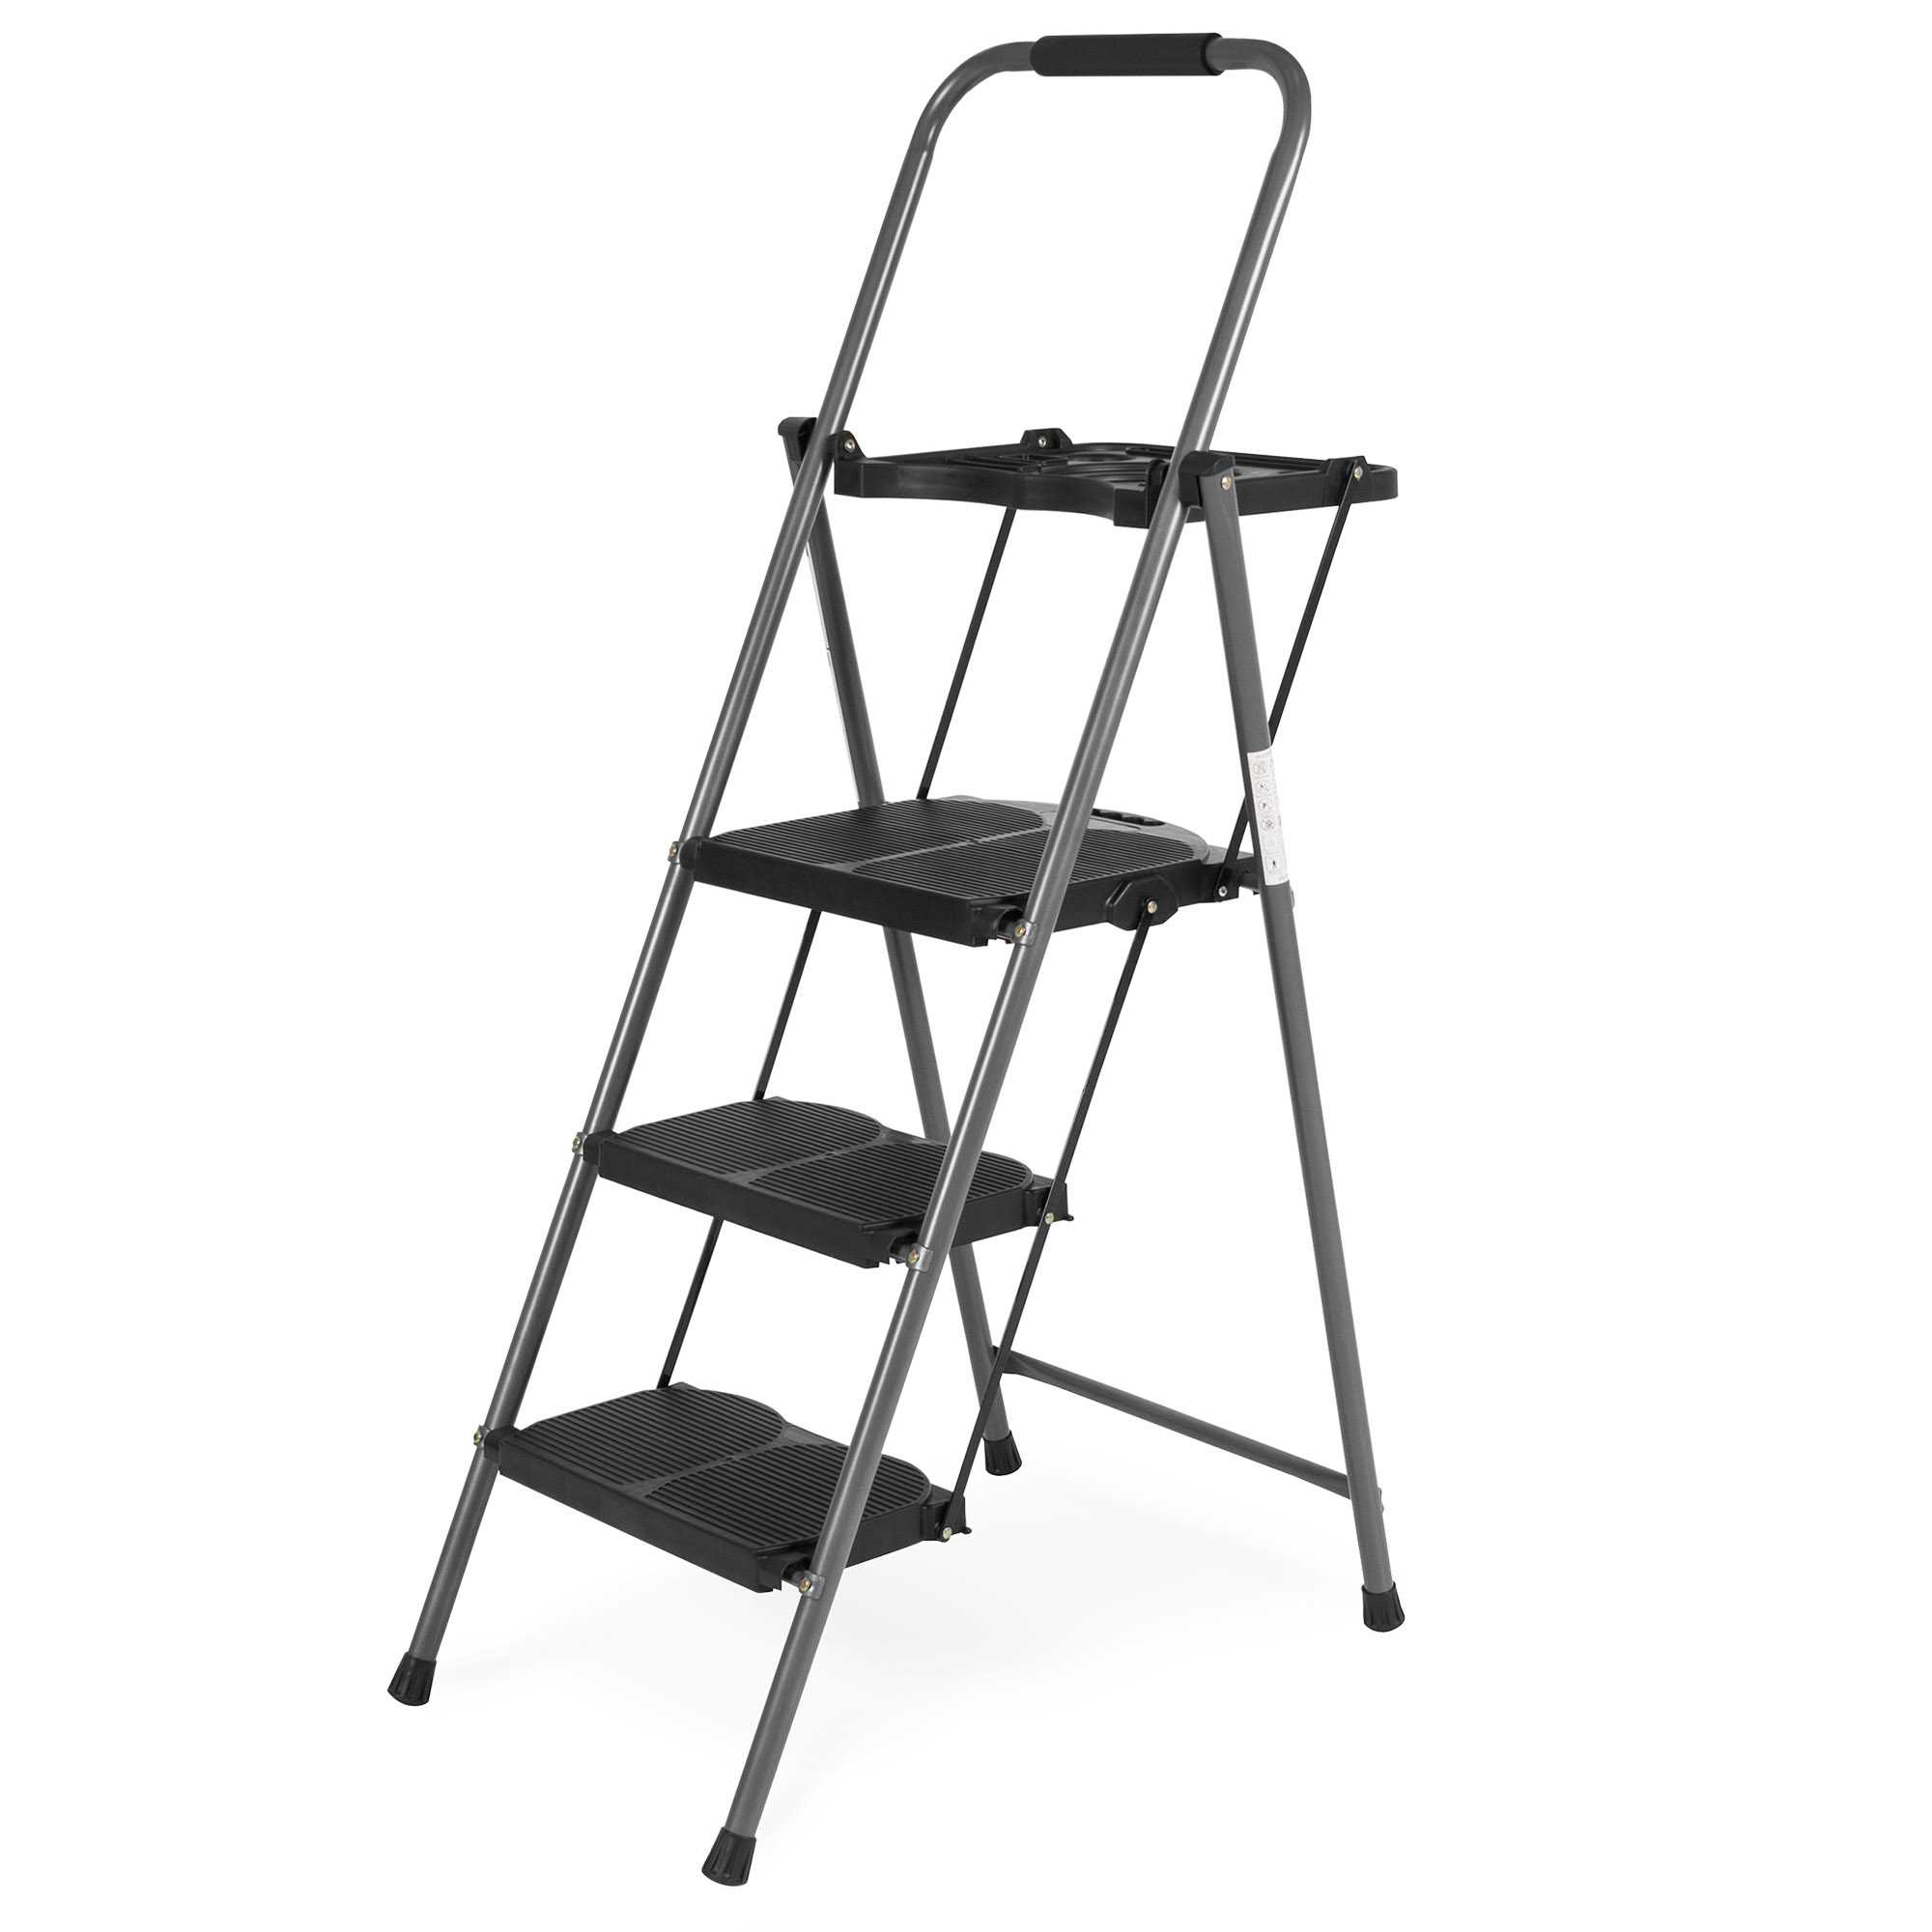 Fine Best Choice Folding Steel 3 Step Stool Ladder Tool Equipment For Indoor Outdoor W Hand Grip Wide Platform Steps 330Lbs Capacity Black Evergreenethics Interior Chair Design Evergreenethicsorg